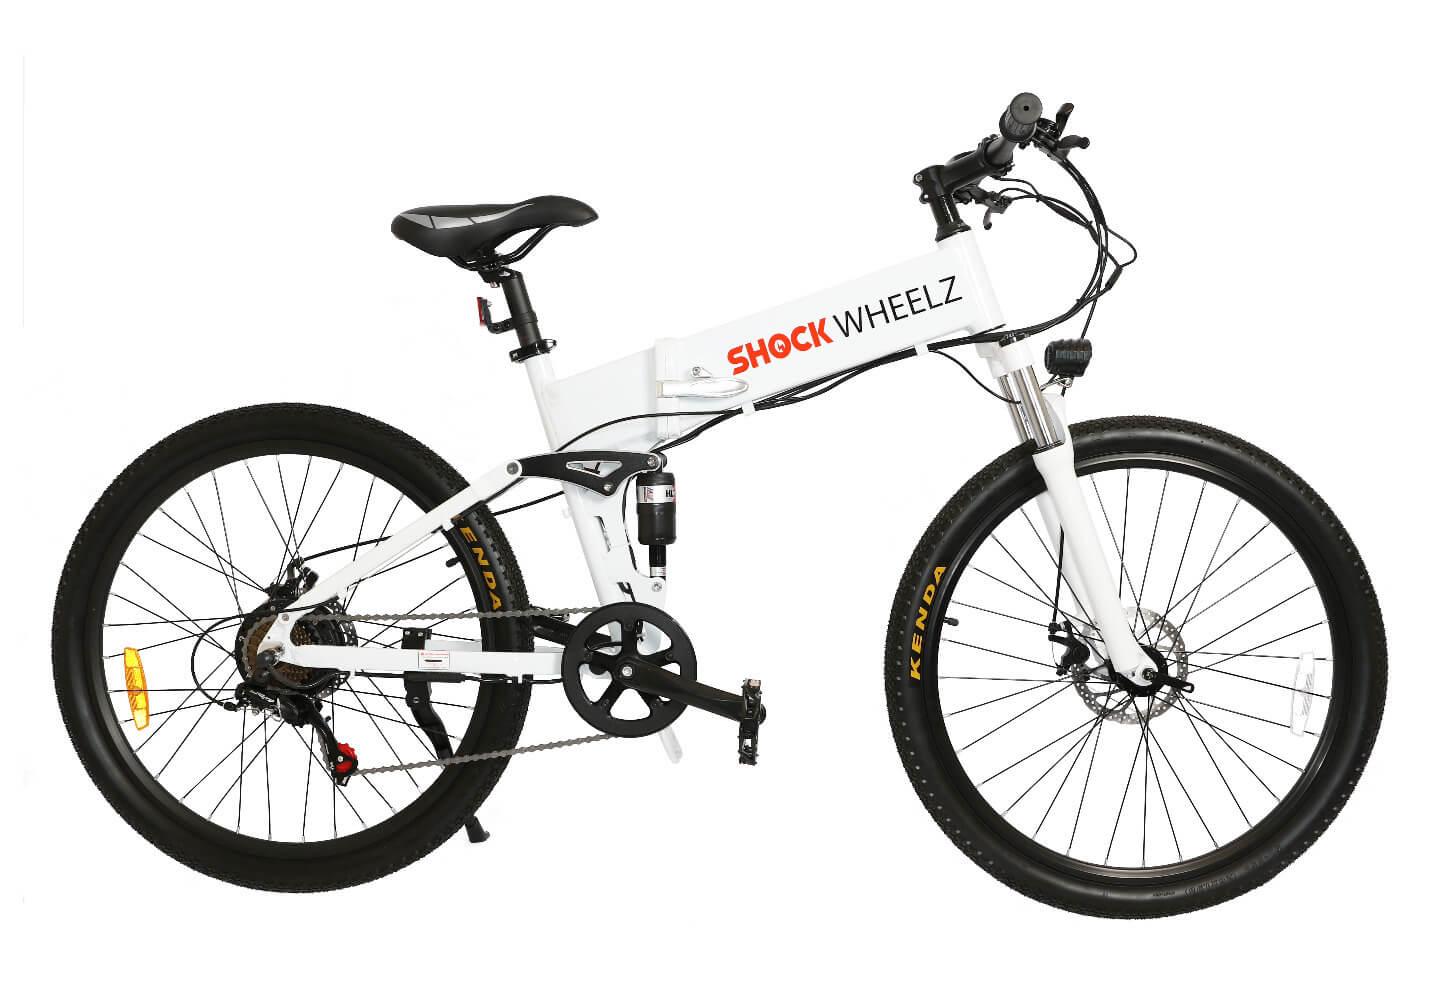 Shock Wheelz White Bike 2